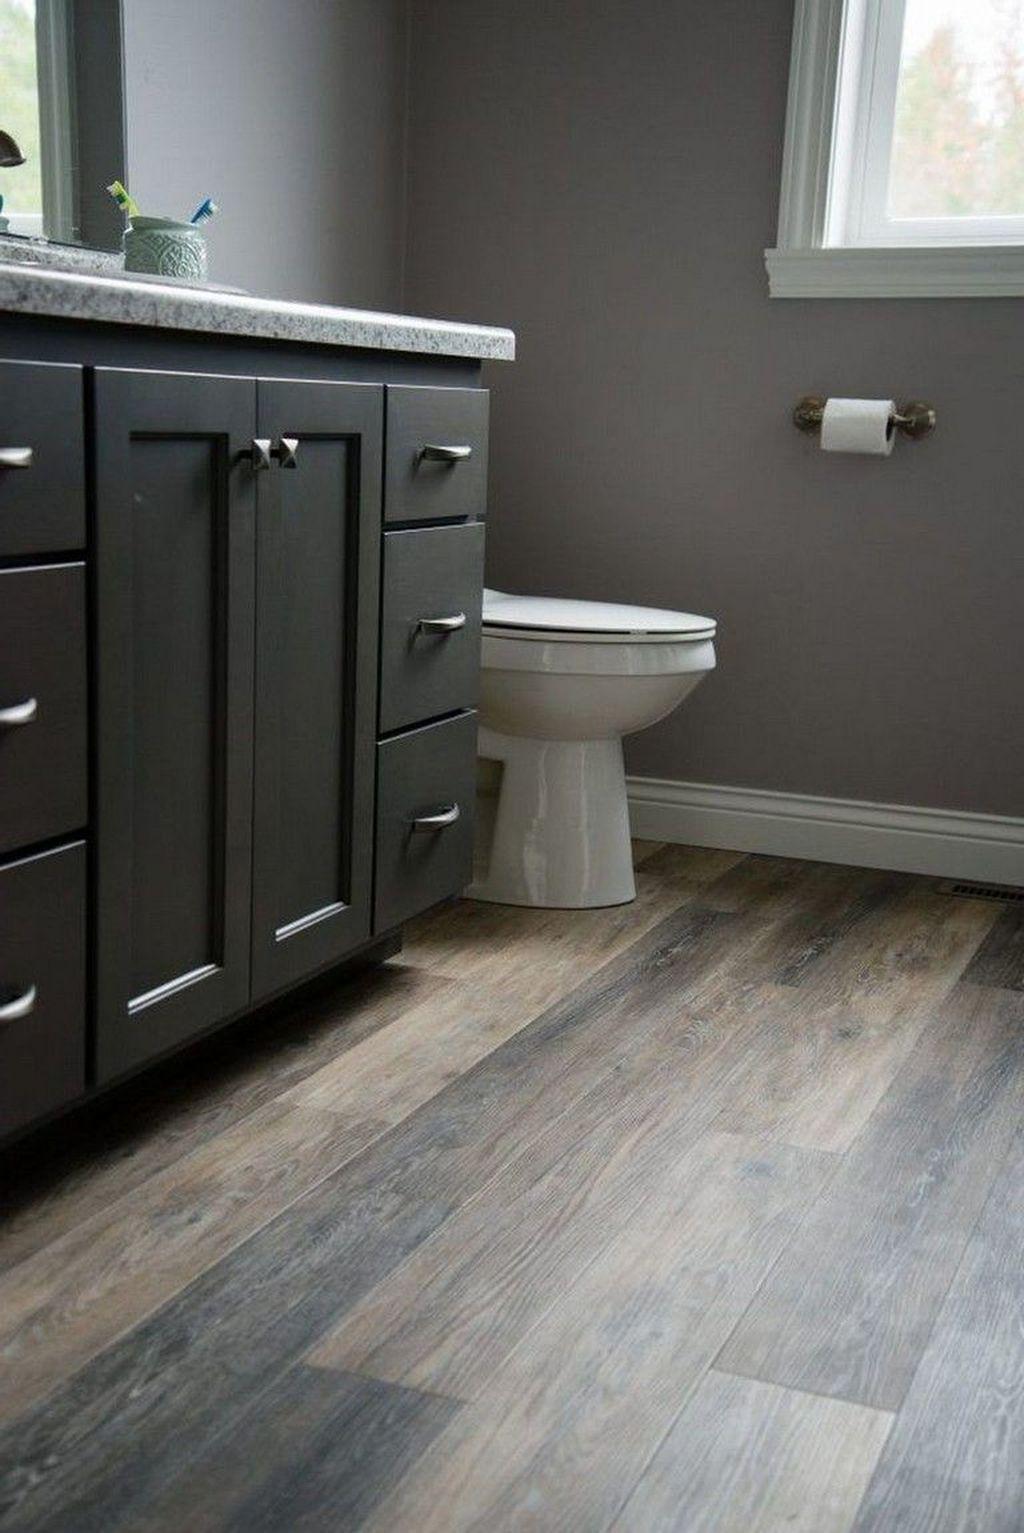 Vinyl Flooring In Bathroom Pros And Cons